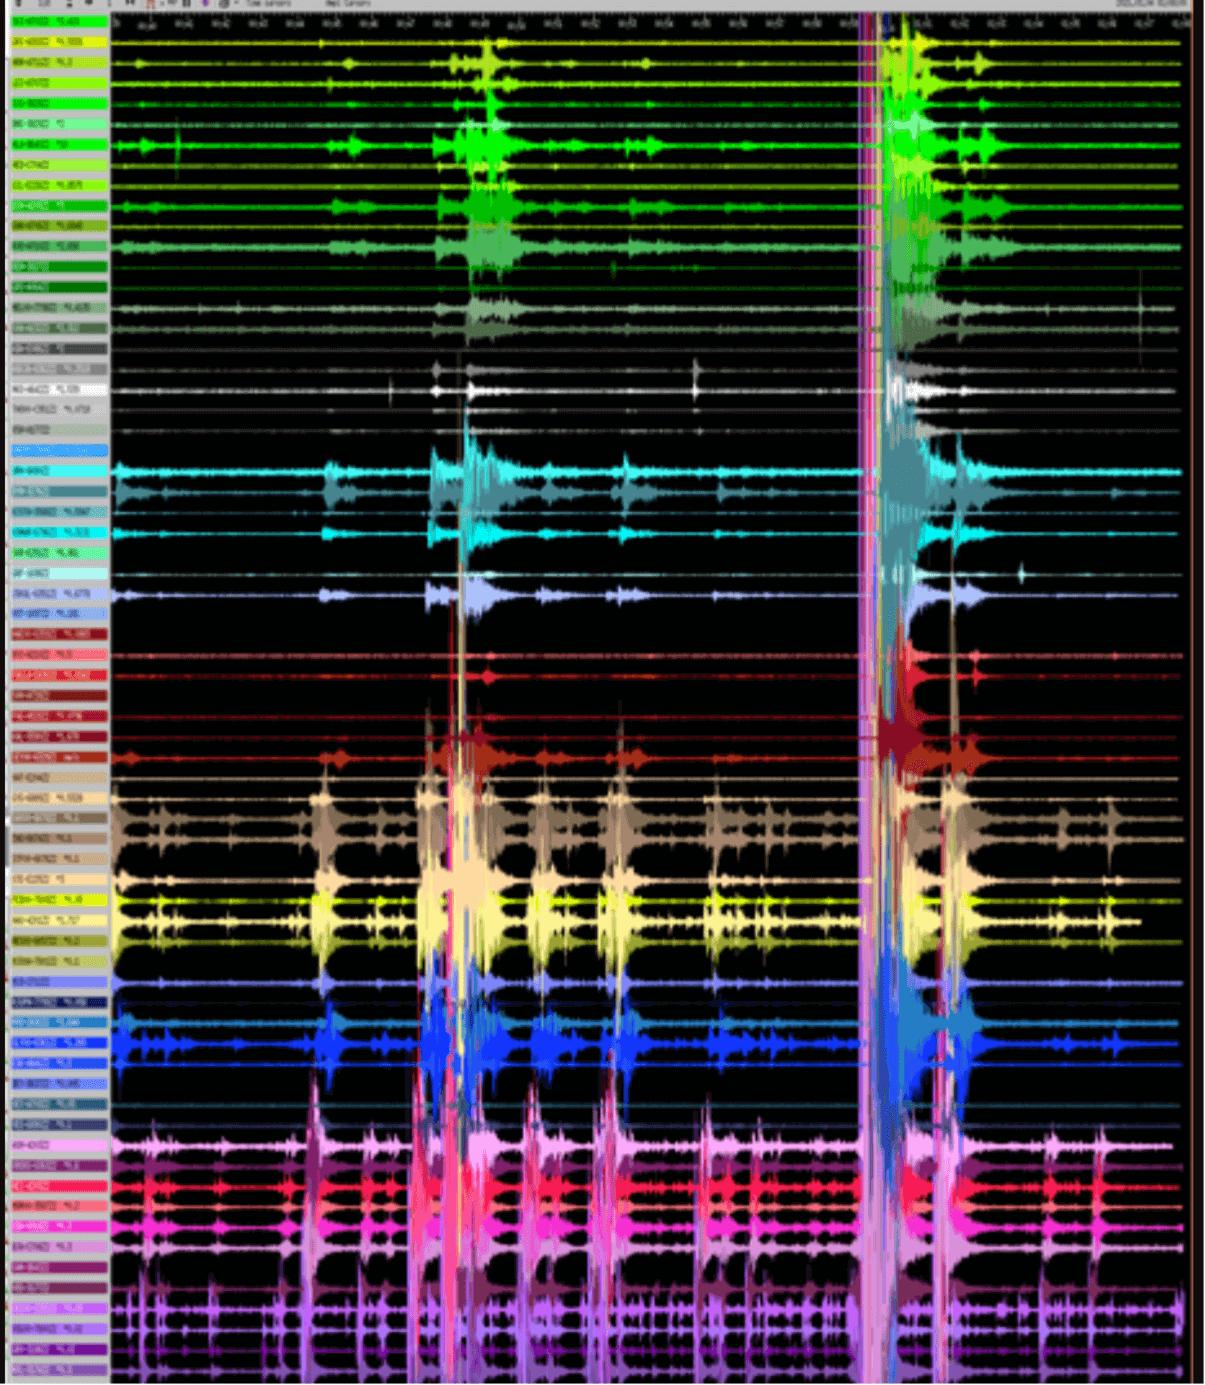 iceland-earthquake-swarm-volcanic-eruption-2021-reykjanes-seismograph